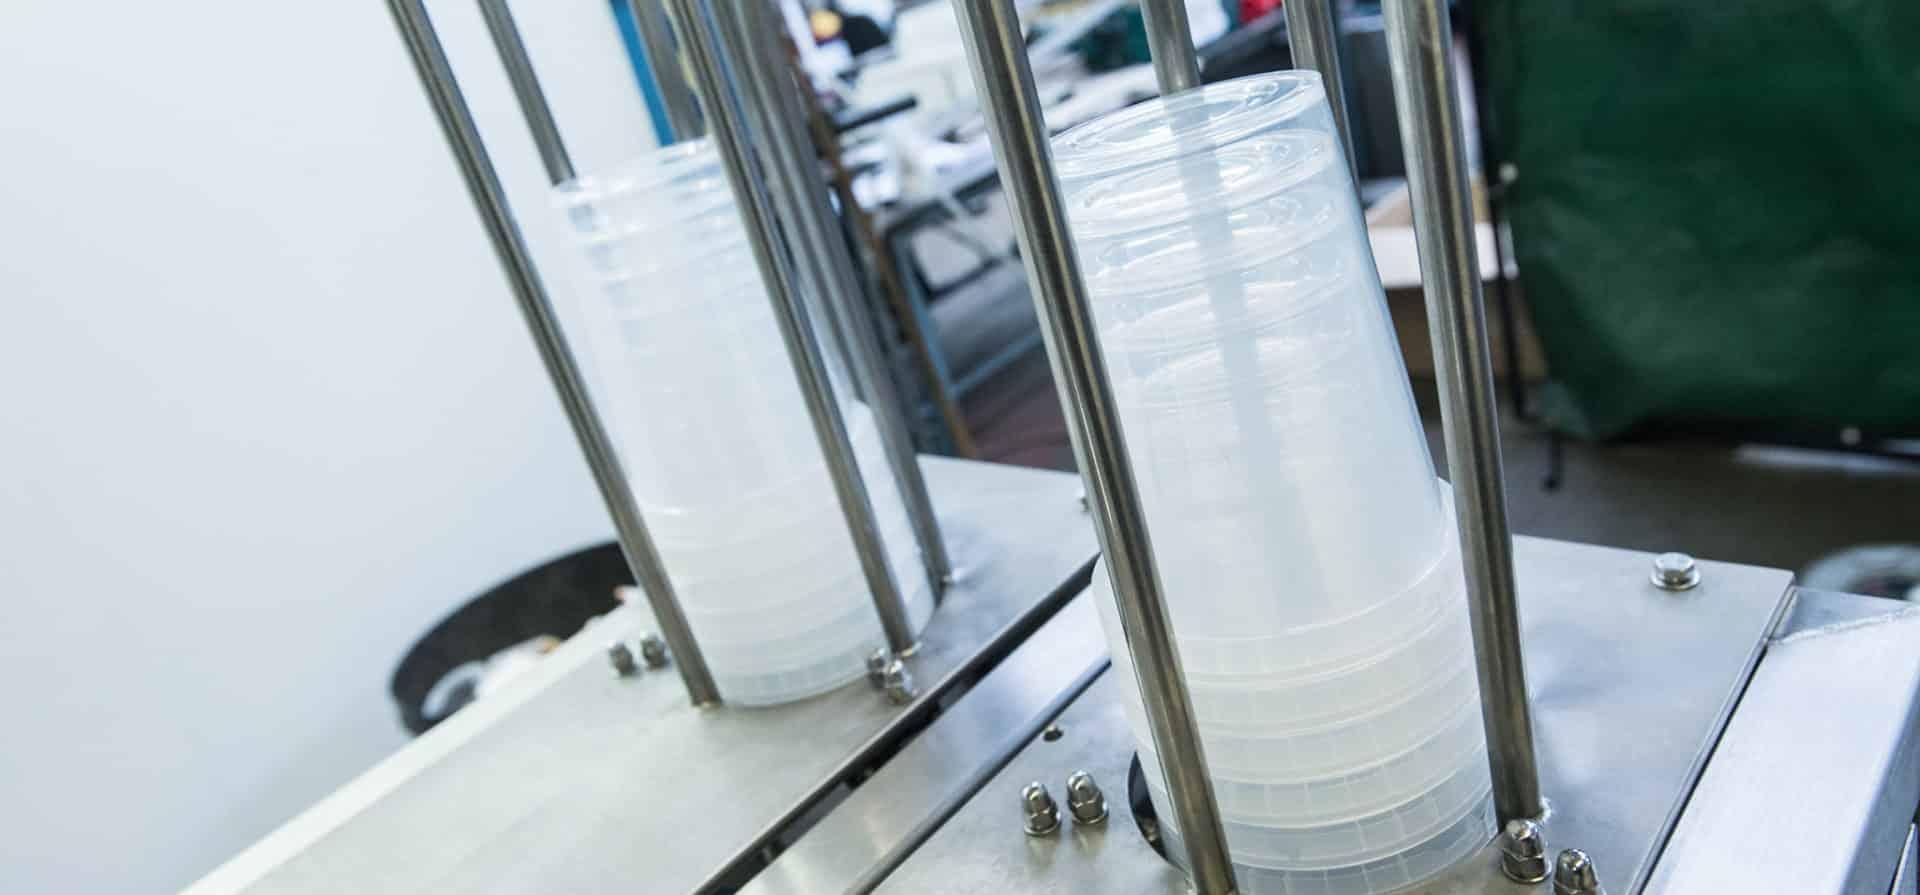 Food Tray Denester Machines - Applications | Euroflow Automation Ltd